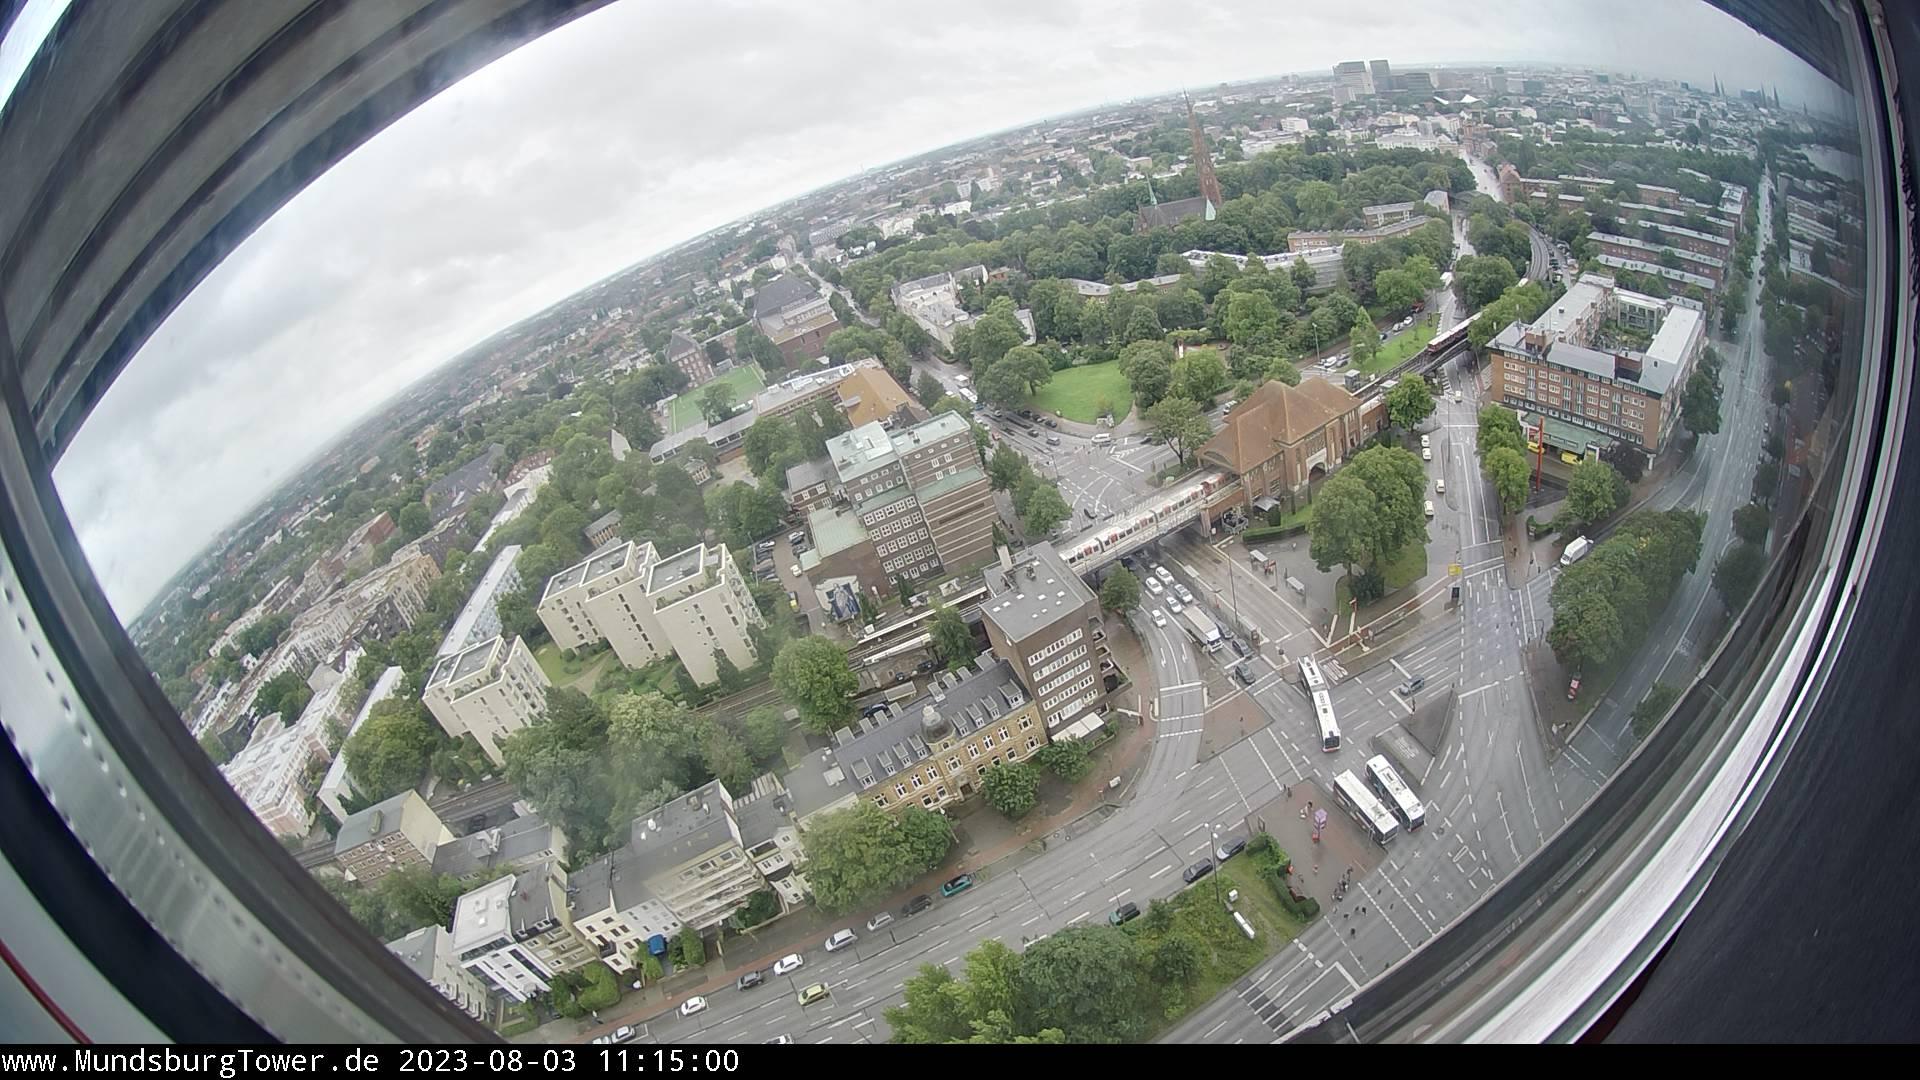 Hamburg – Mundsburg Tower Webcam Live